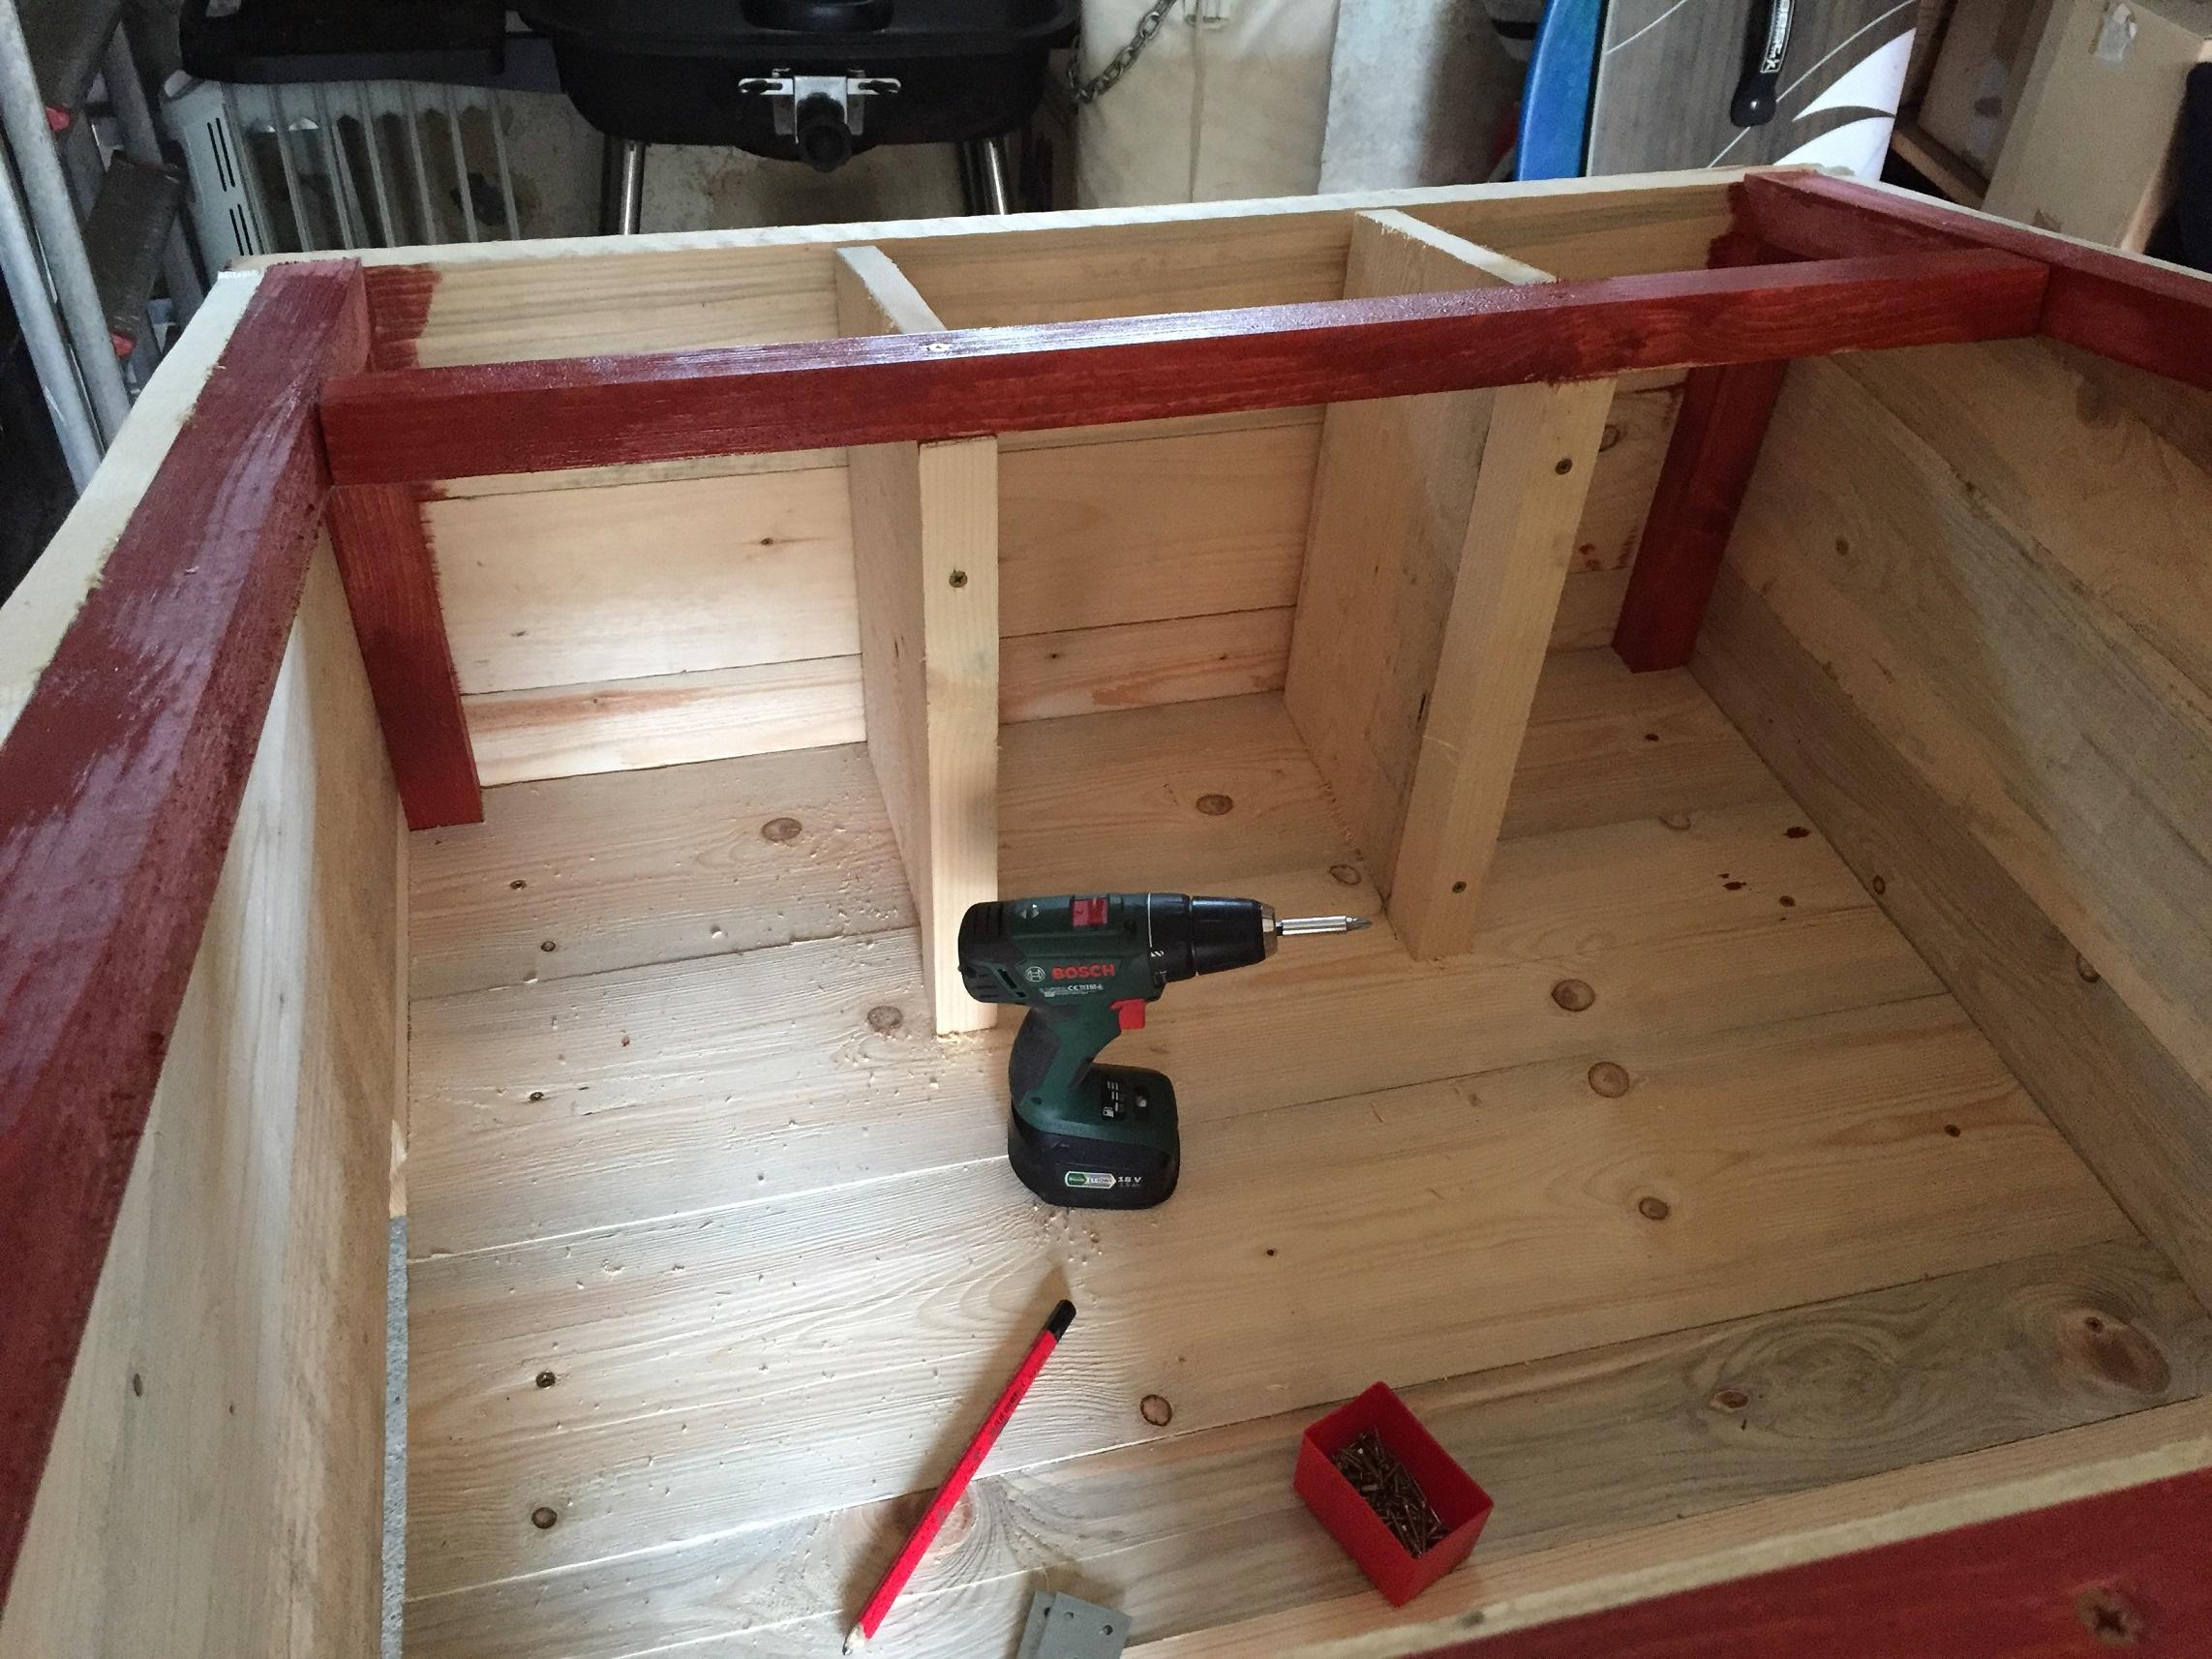 DIY chicken coop ideas 7